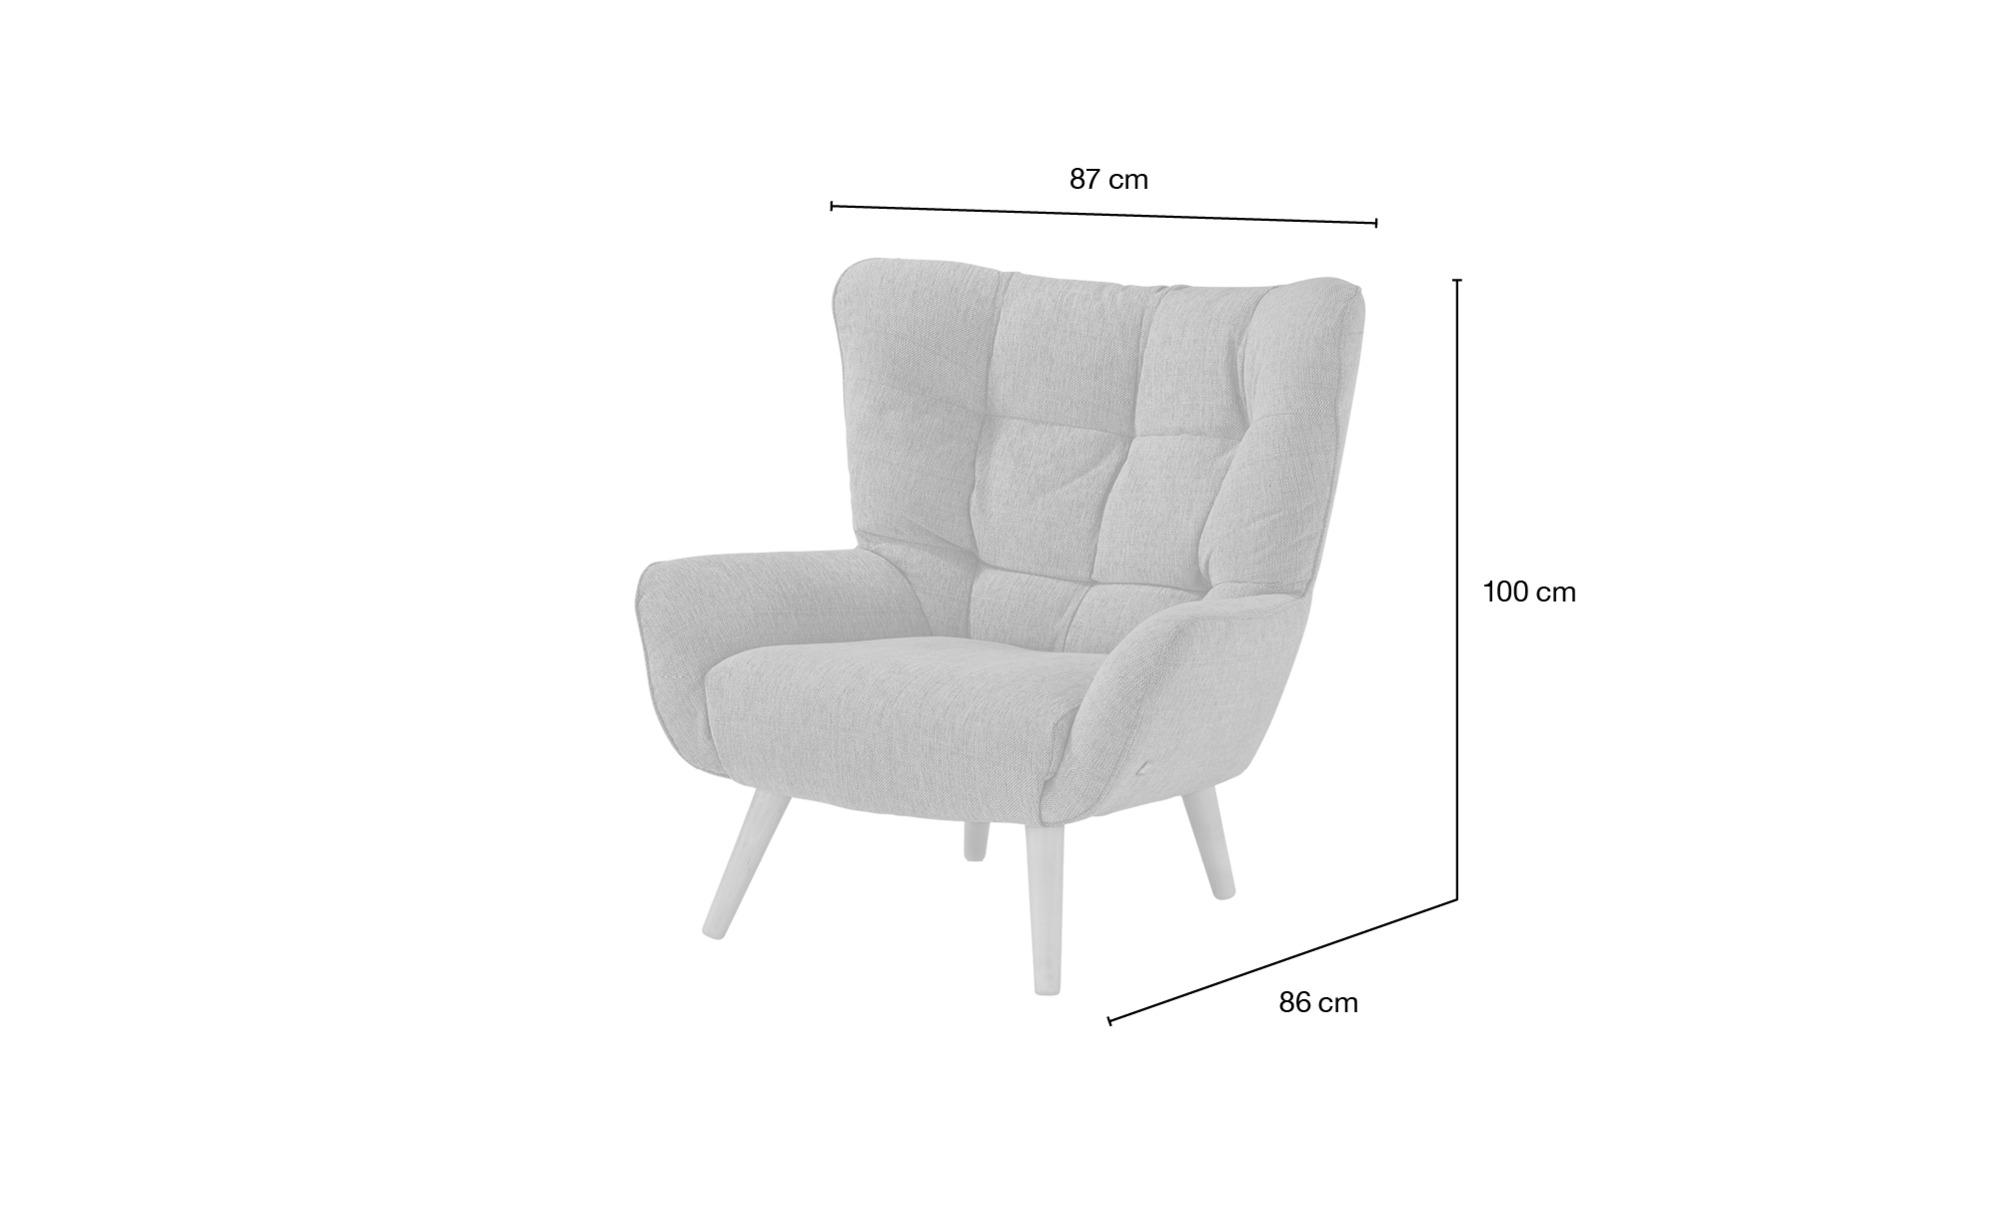 SOHO Polstersessel  Jolyn ¦ schwarz ¦ Maße (cm): B: 87 H: 100 T: 86 Polstermöbel > Sessel > Ohrensessel - Höffner